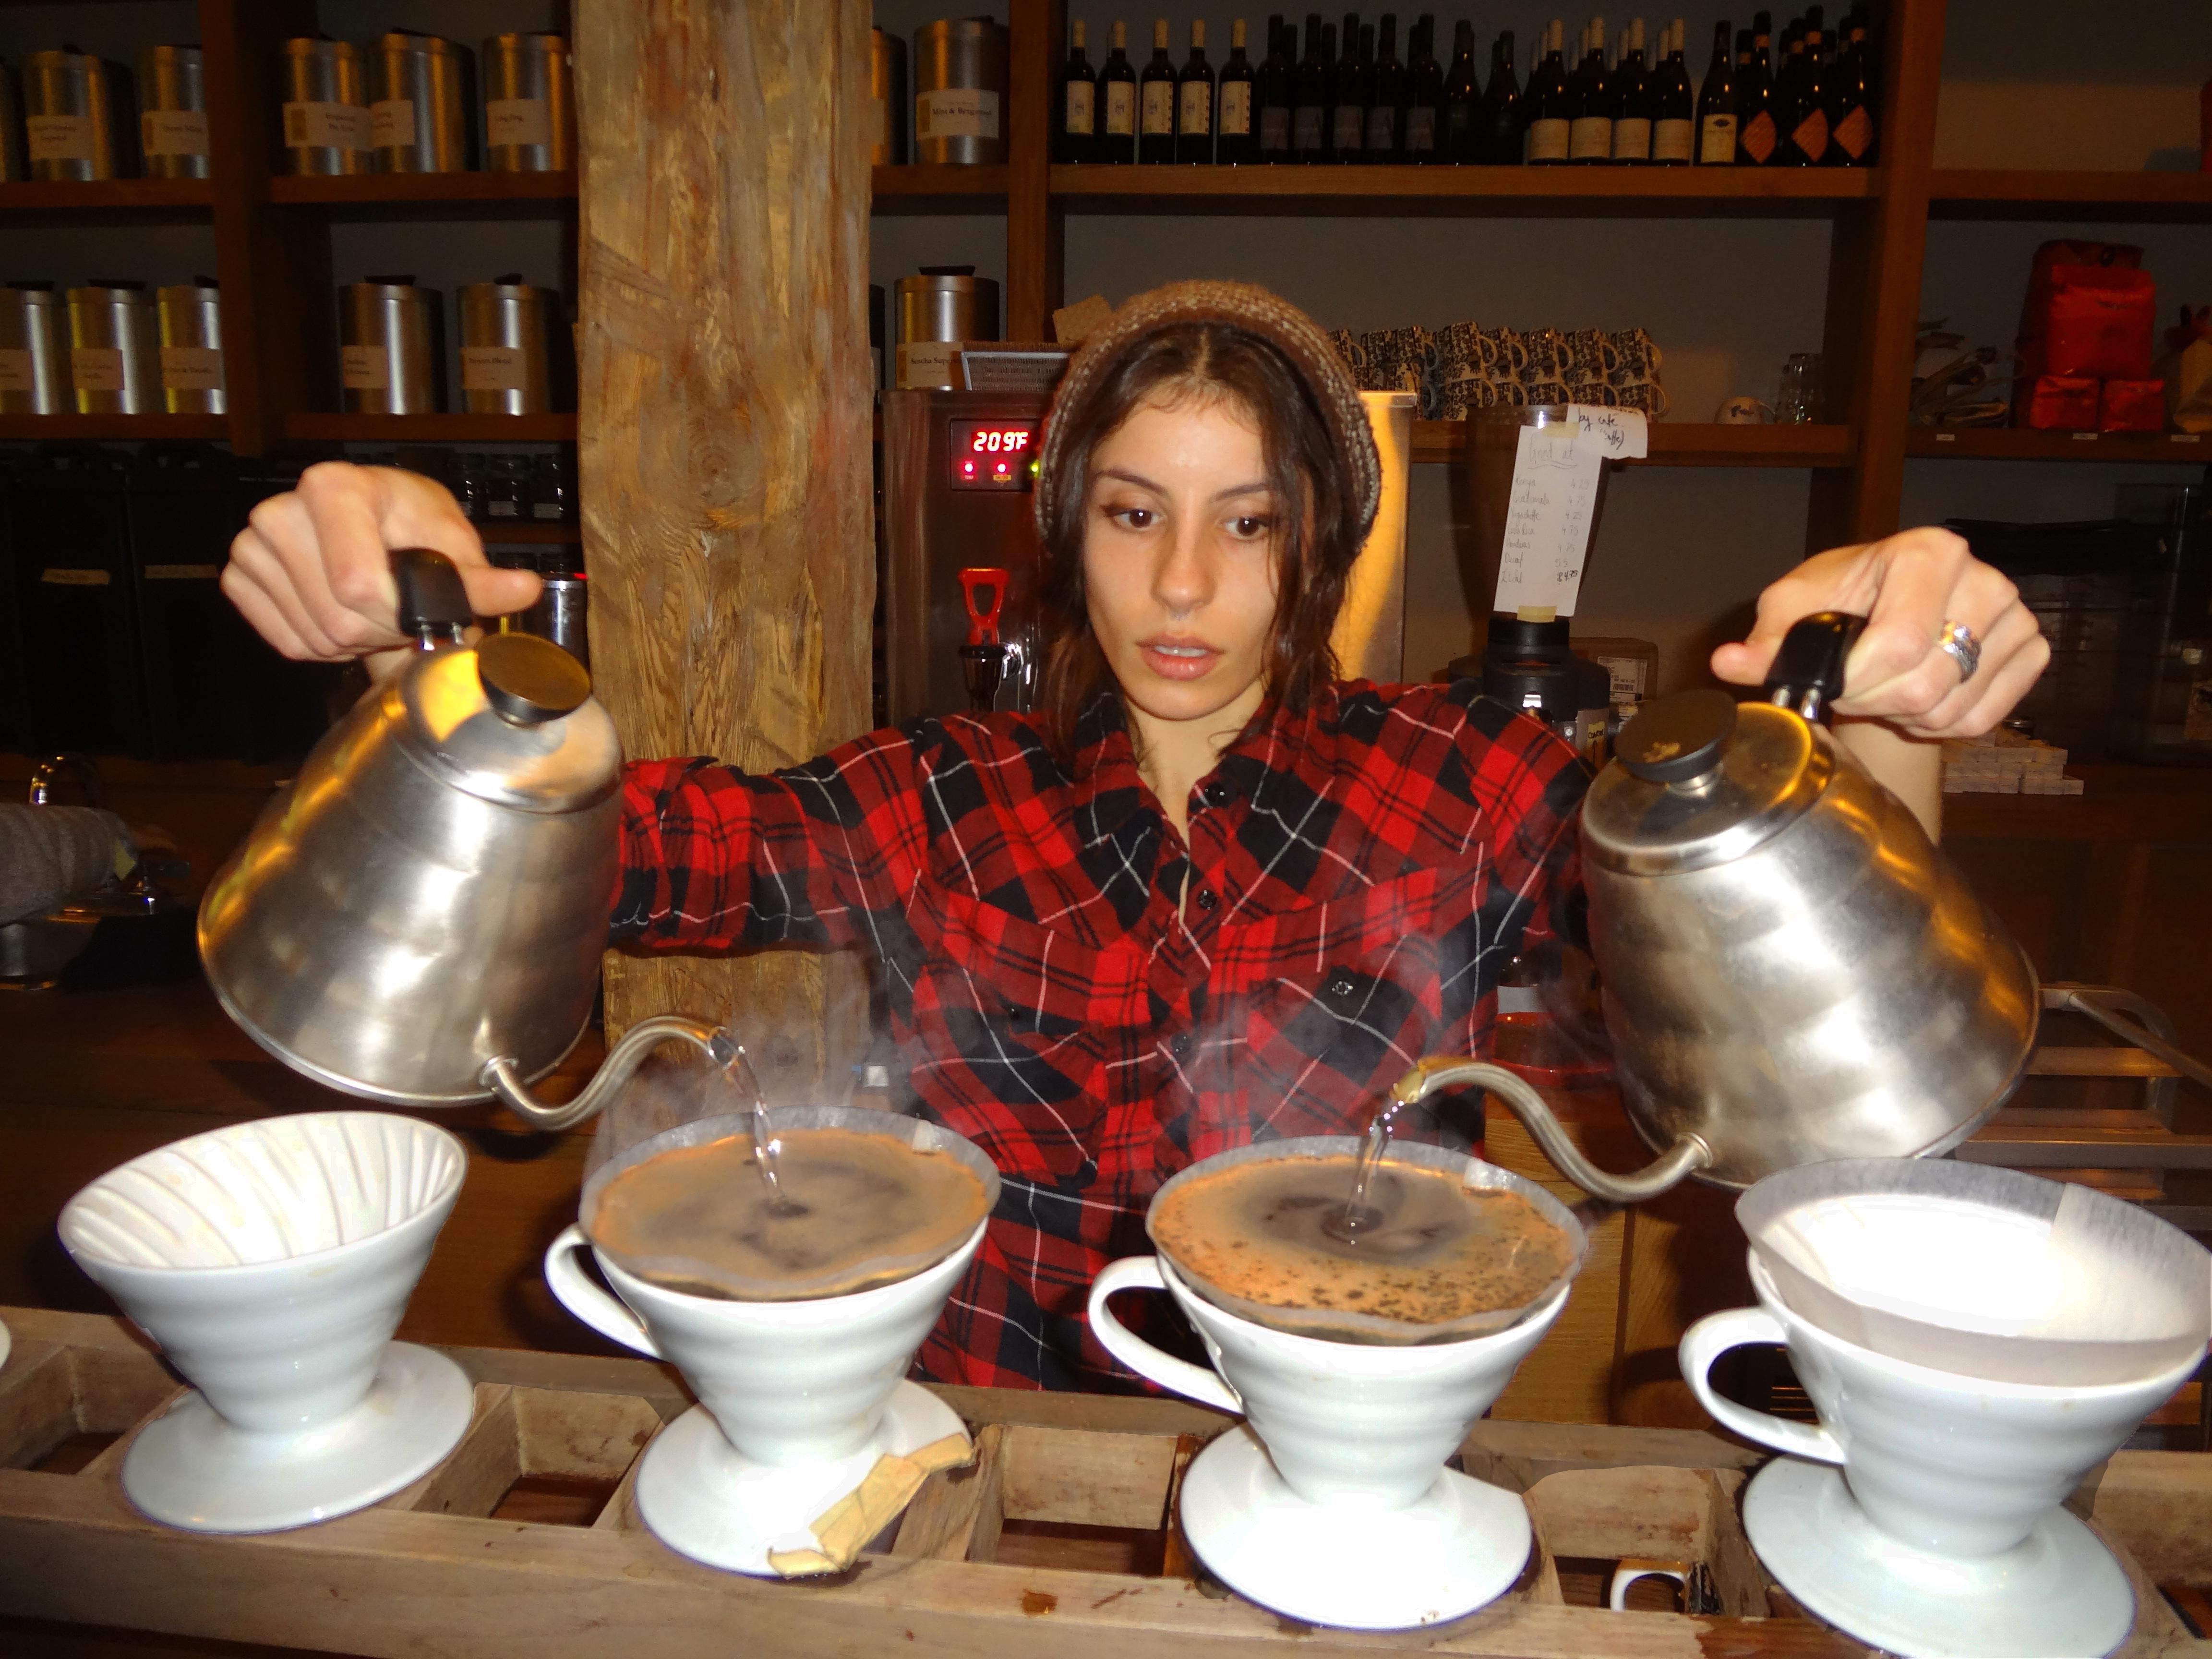 Kaffe 1668 pour over lady